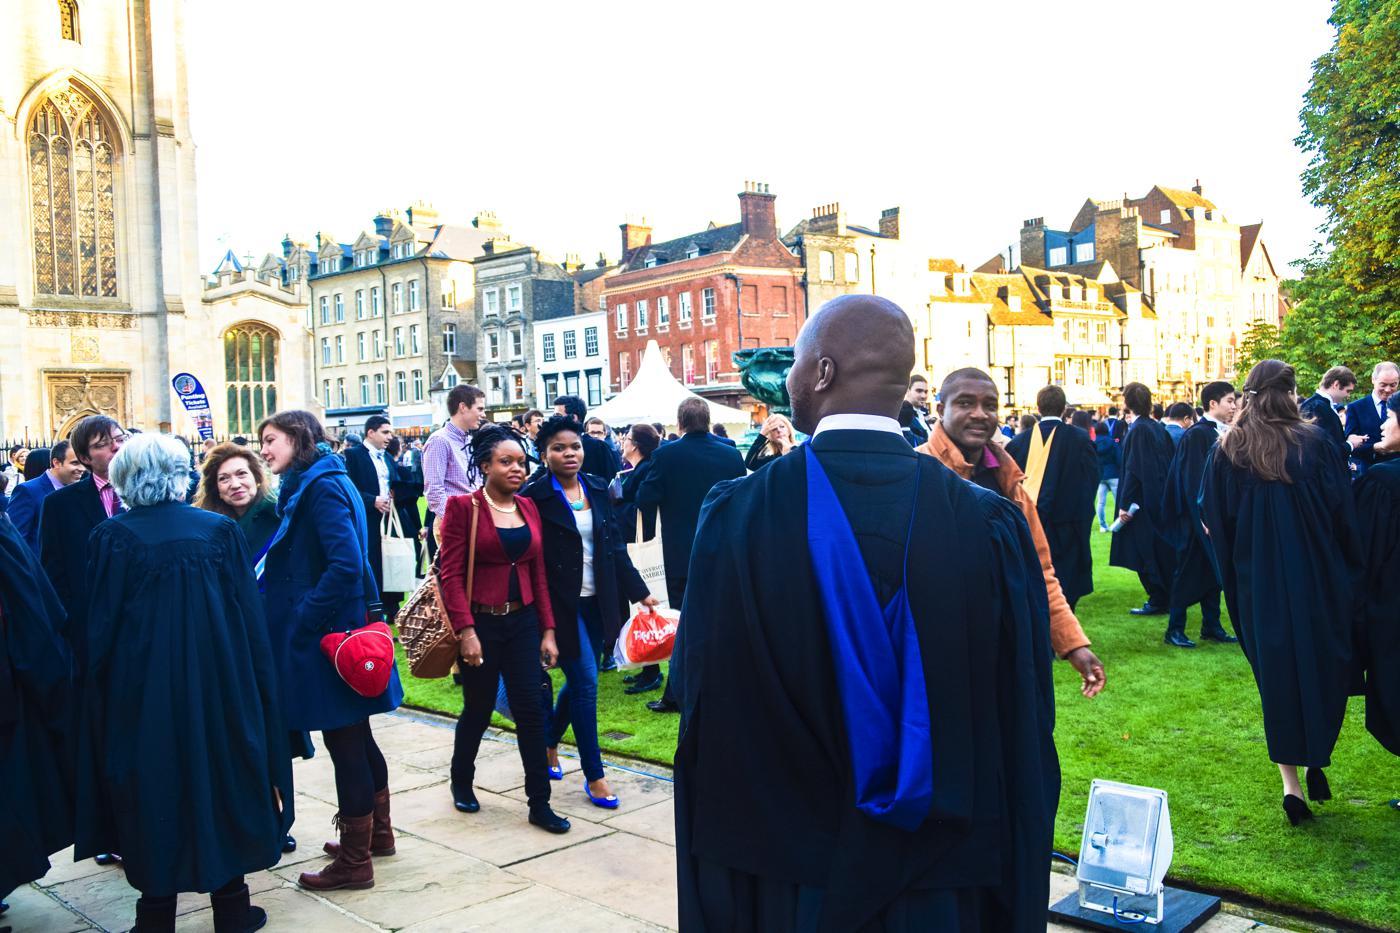 The University of Cambridge, Graduation, Senate House, Cambridge, England (21)